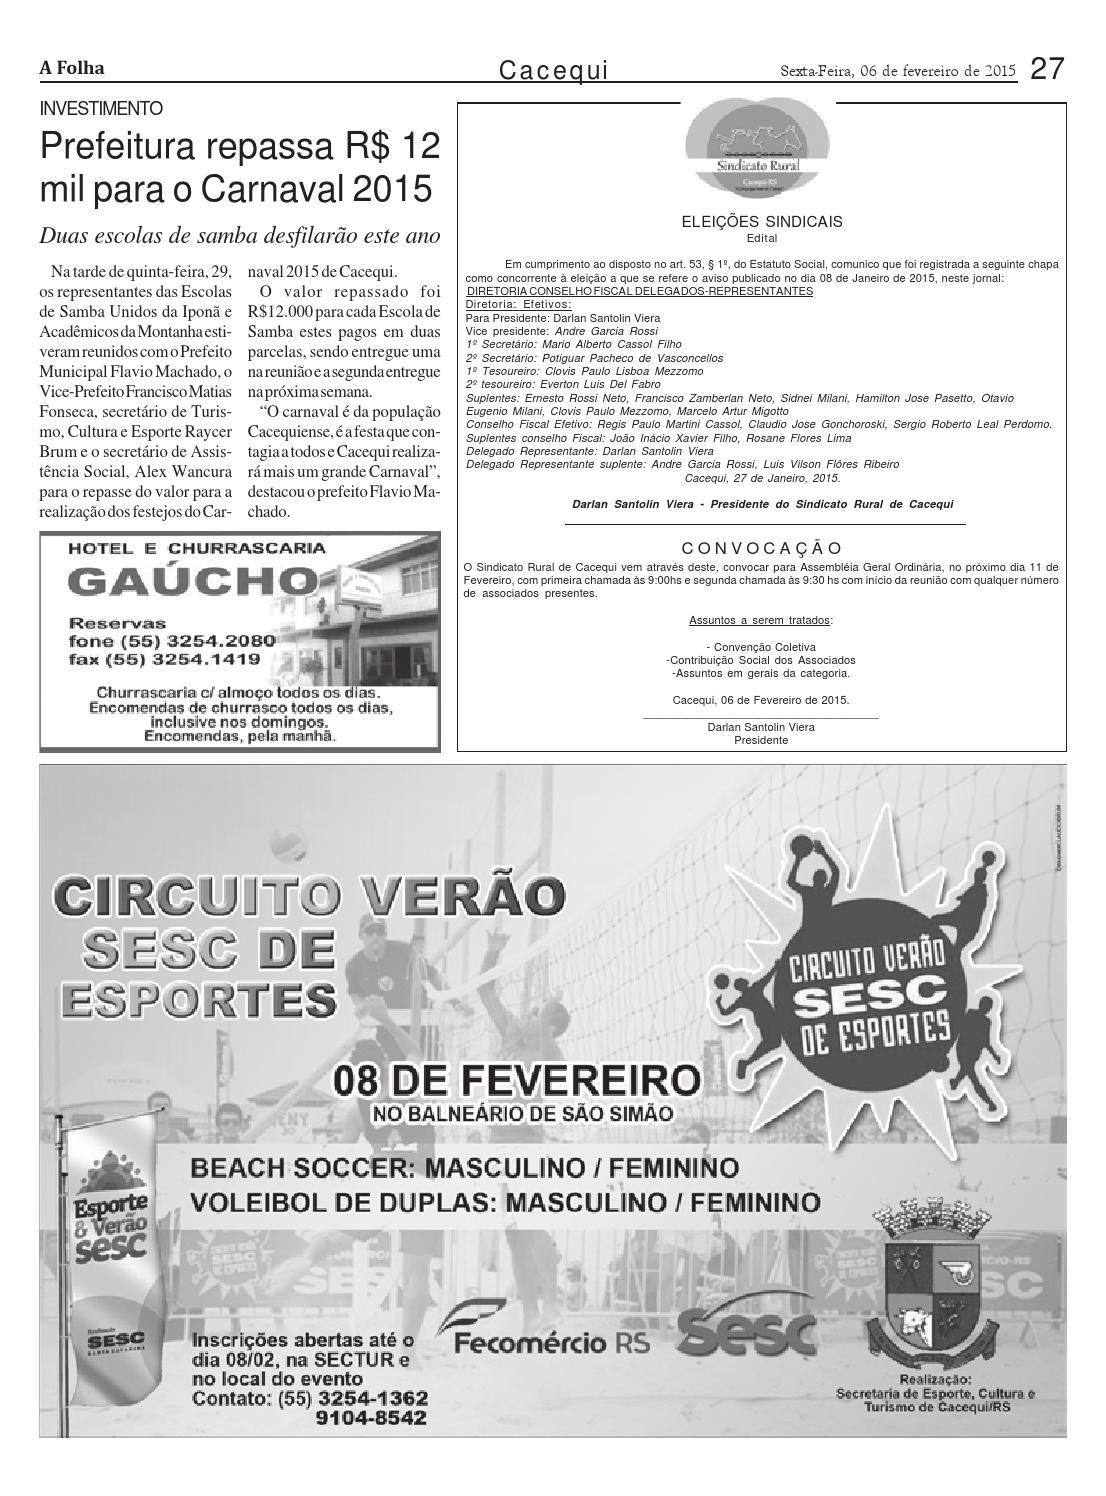 d7aa1fdd0 Edição 477 by Jornal A Folha - issuu